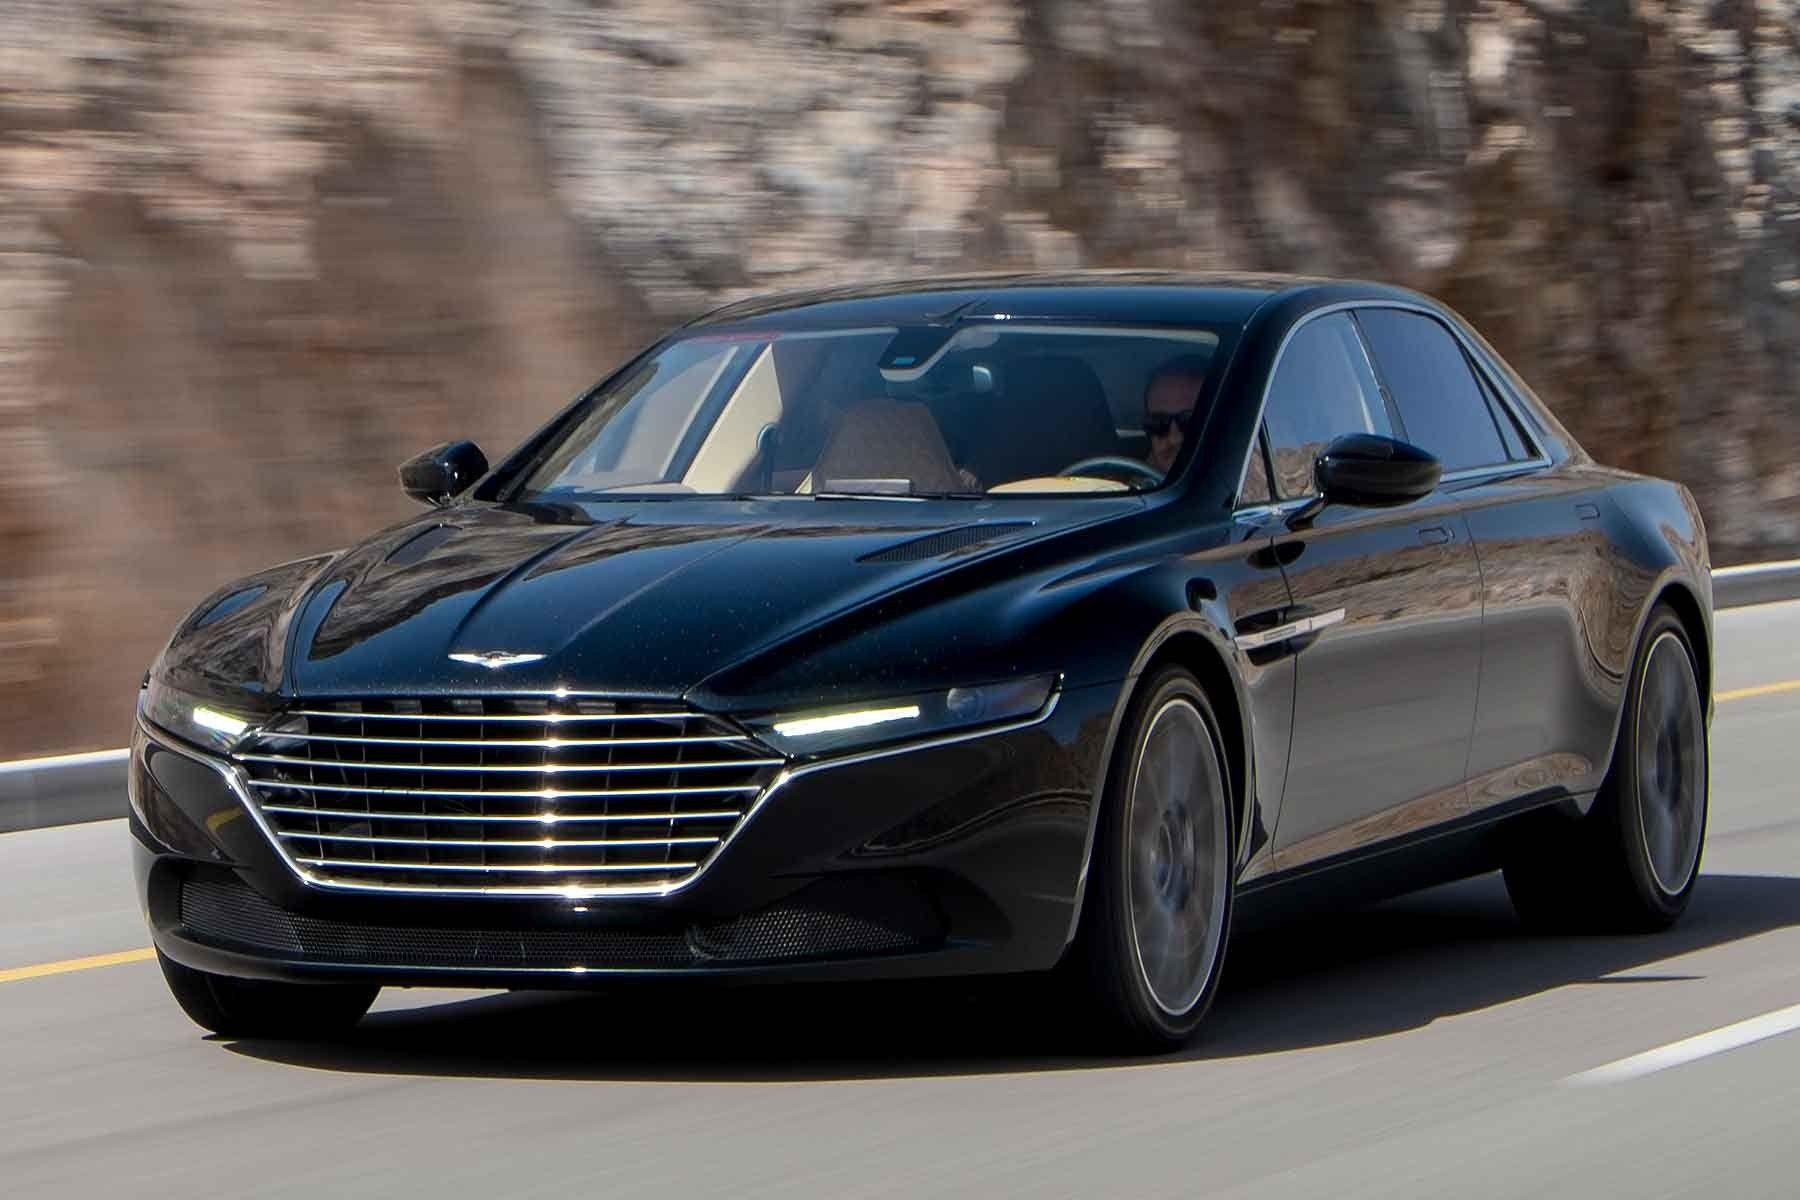 New Luxury Cars 2018 Luxury Things Aston Martin Lagonda Best Luxury Sports Car New Luxury Cars